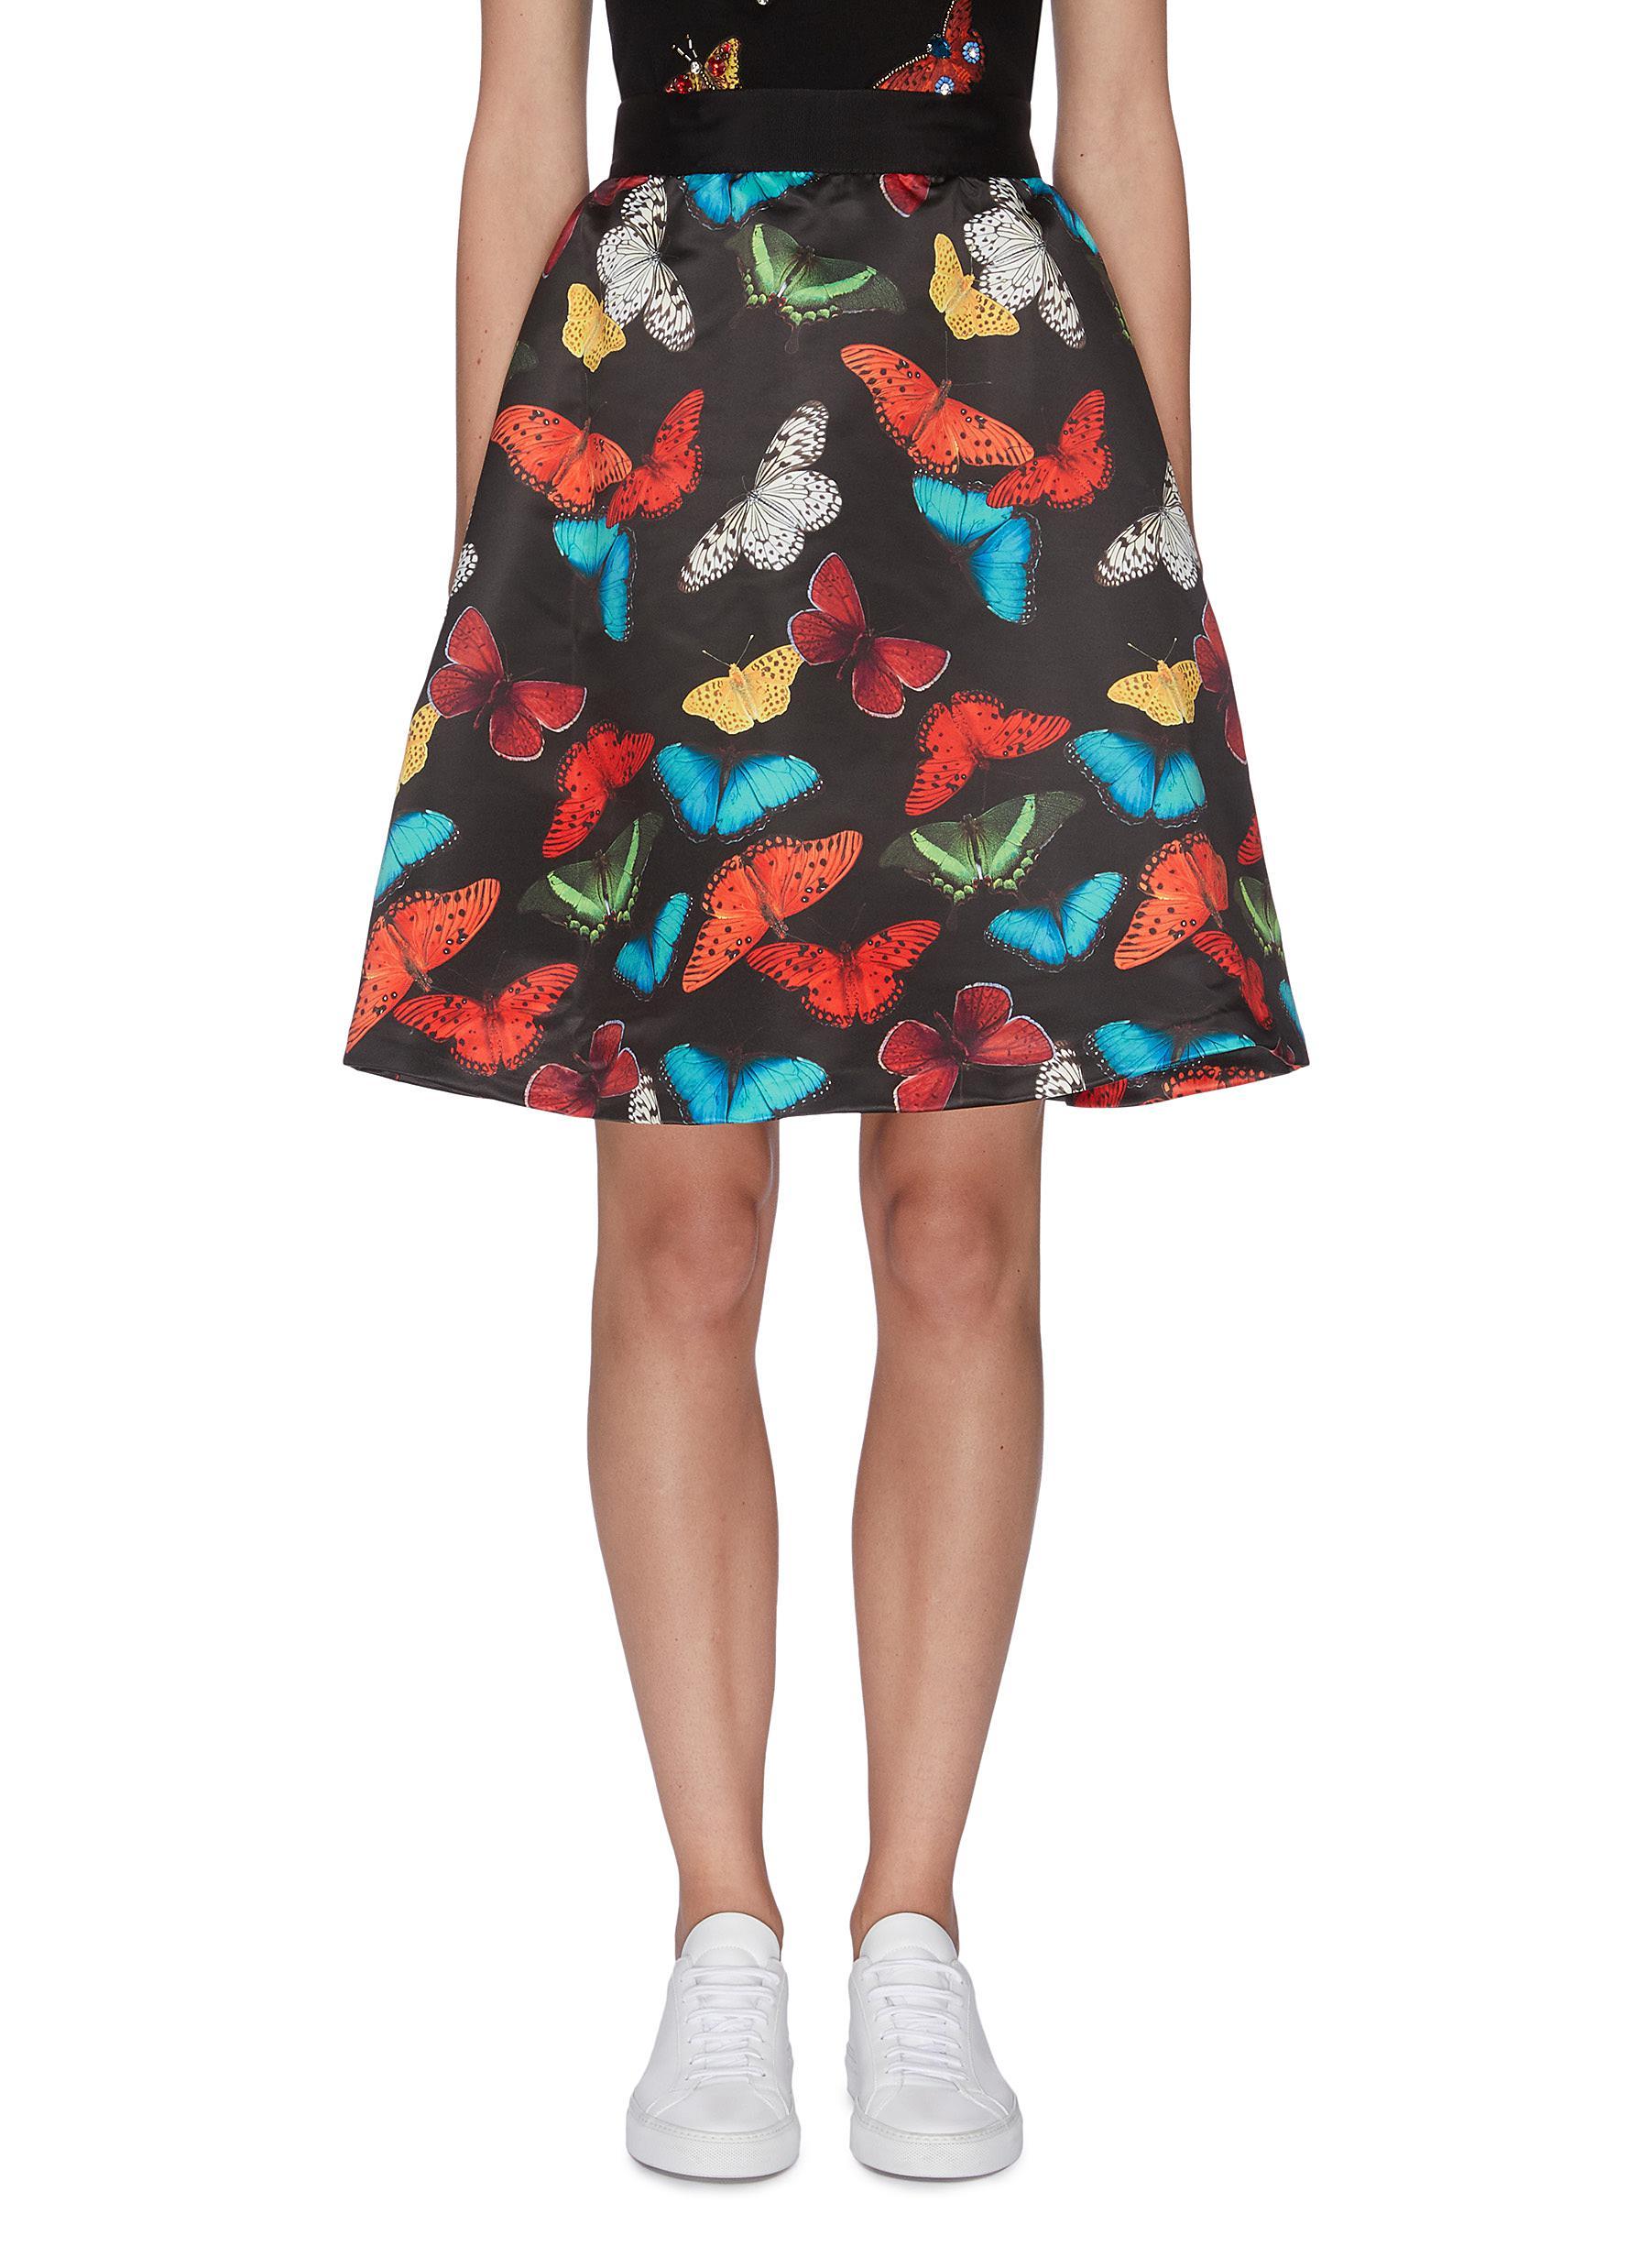 Buy Alice + Olivia Skirts 'Earla' butterfly print flared skirt